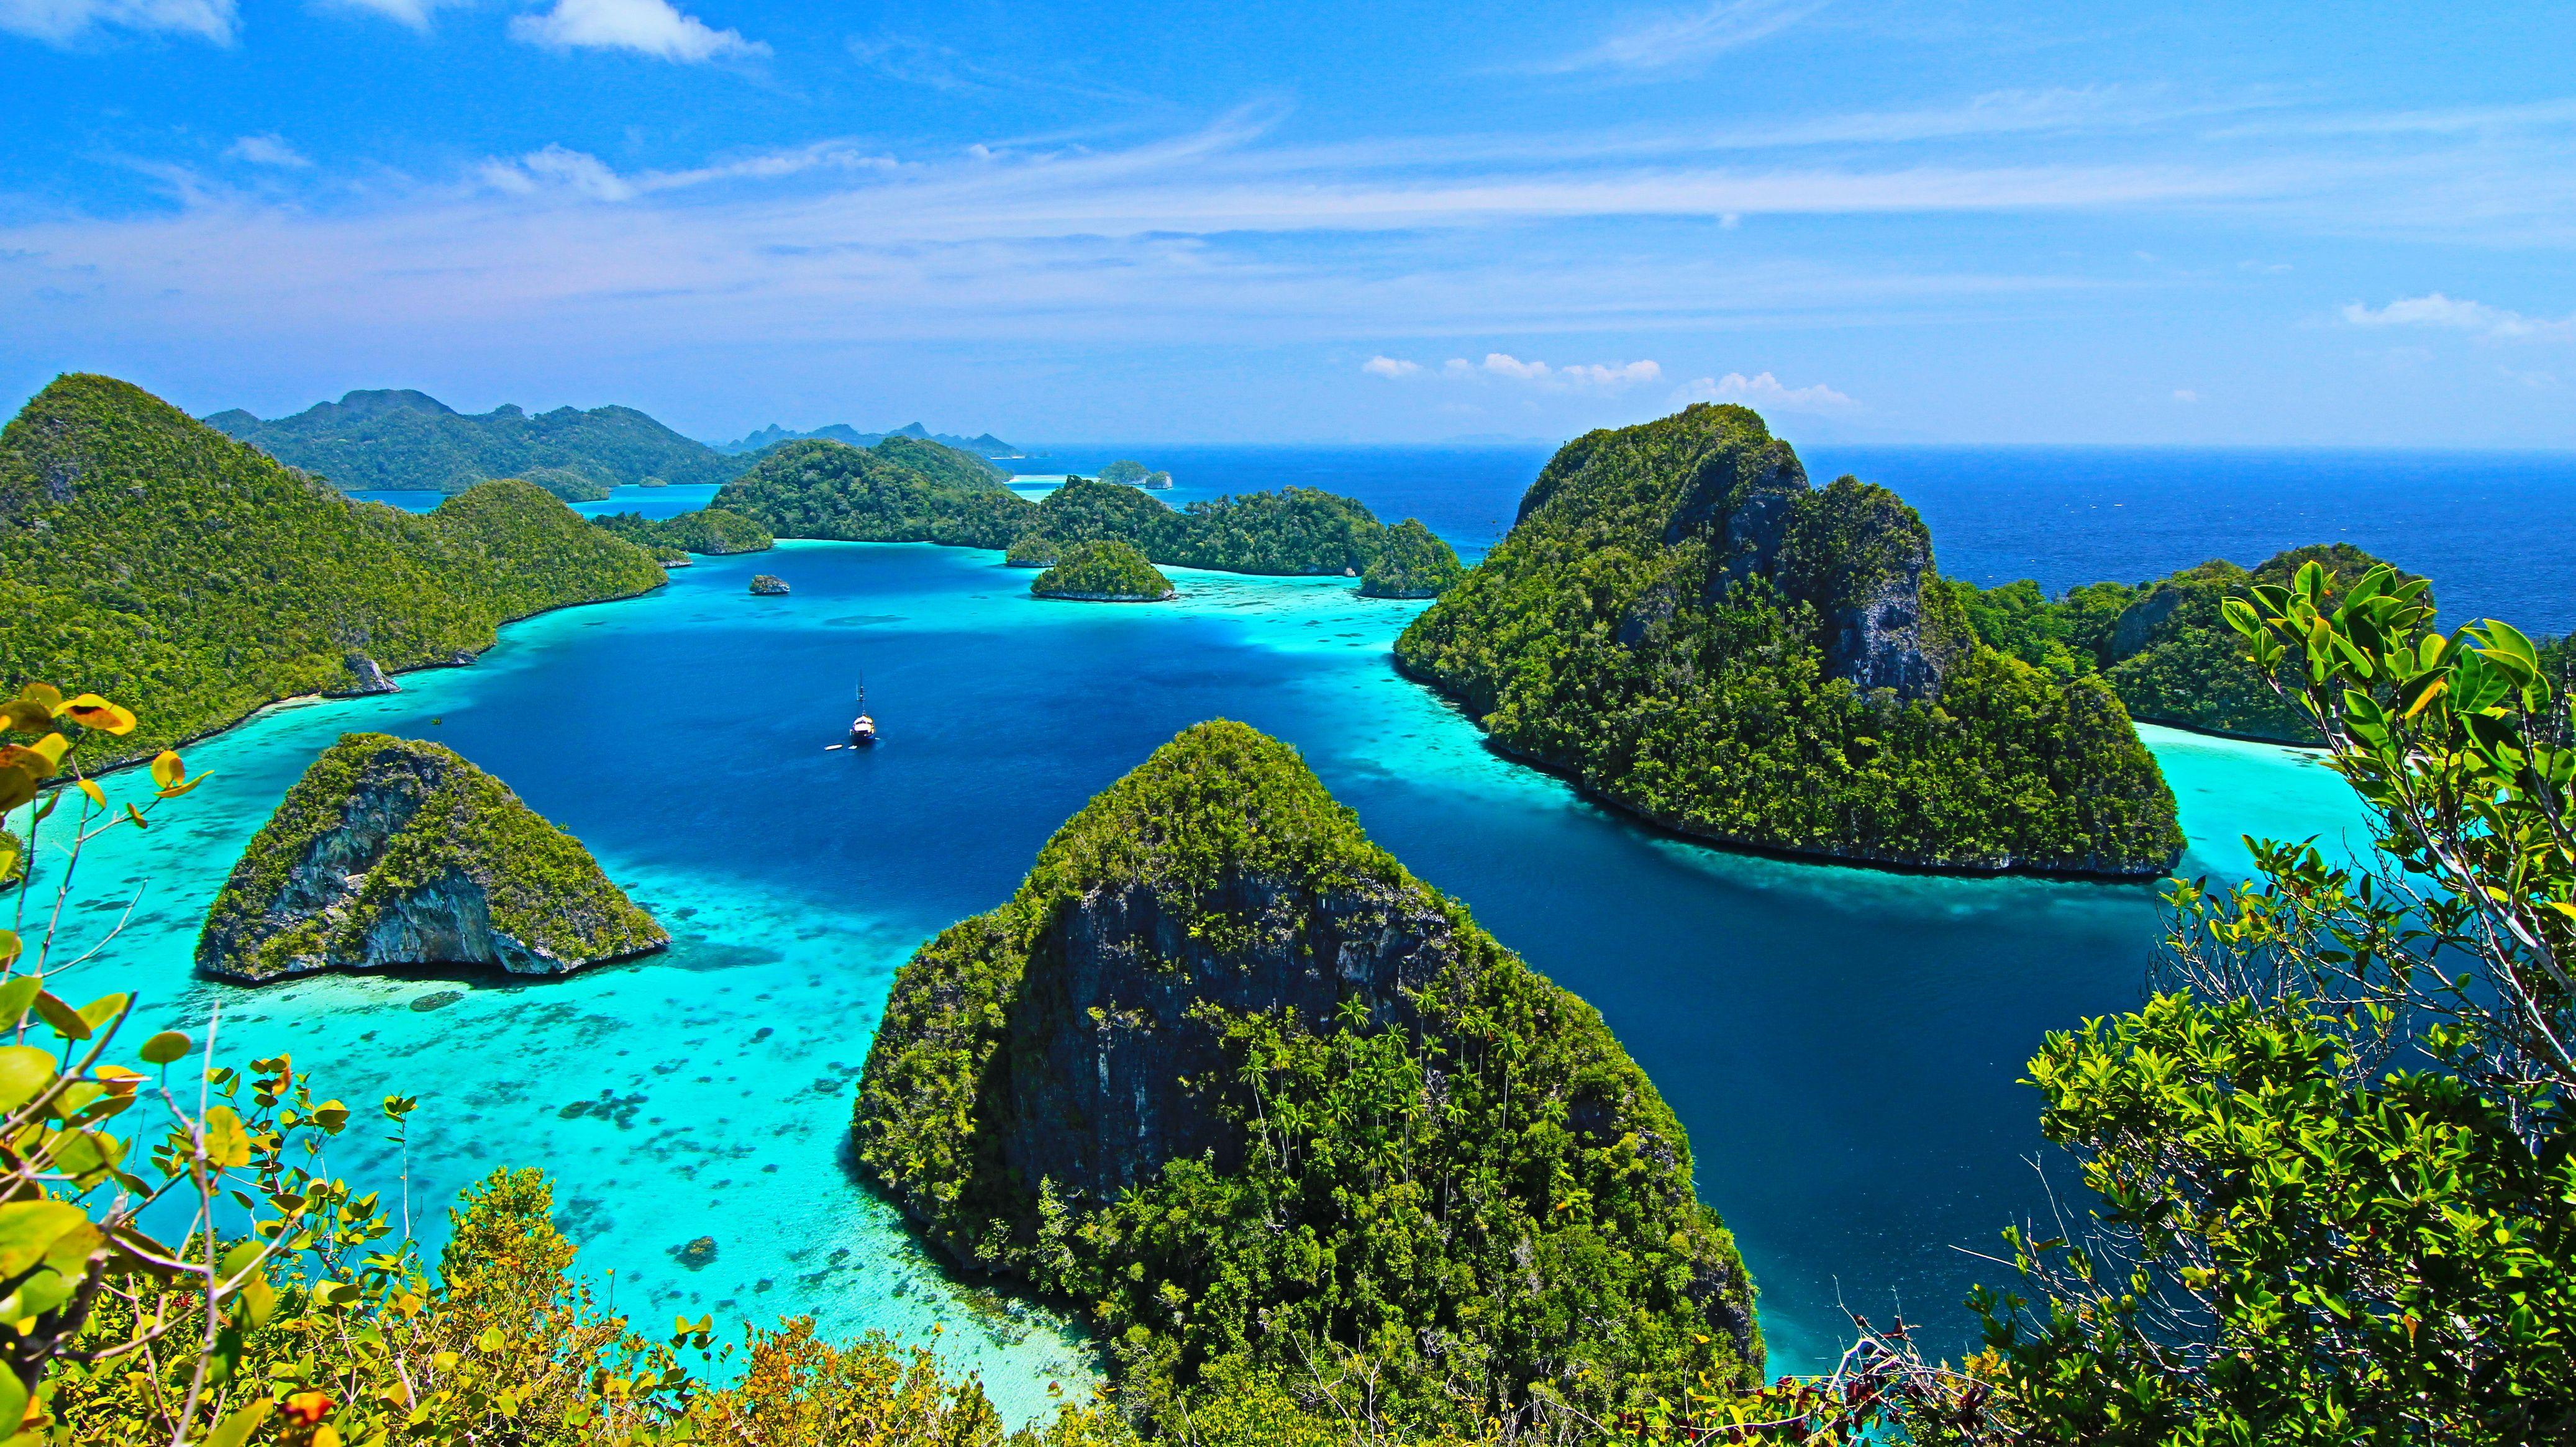 Wayag Islands in Raja Ampat, Papua Barat